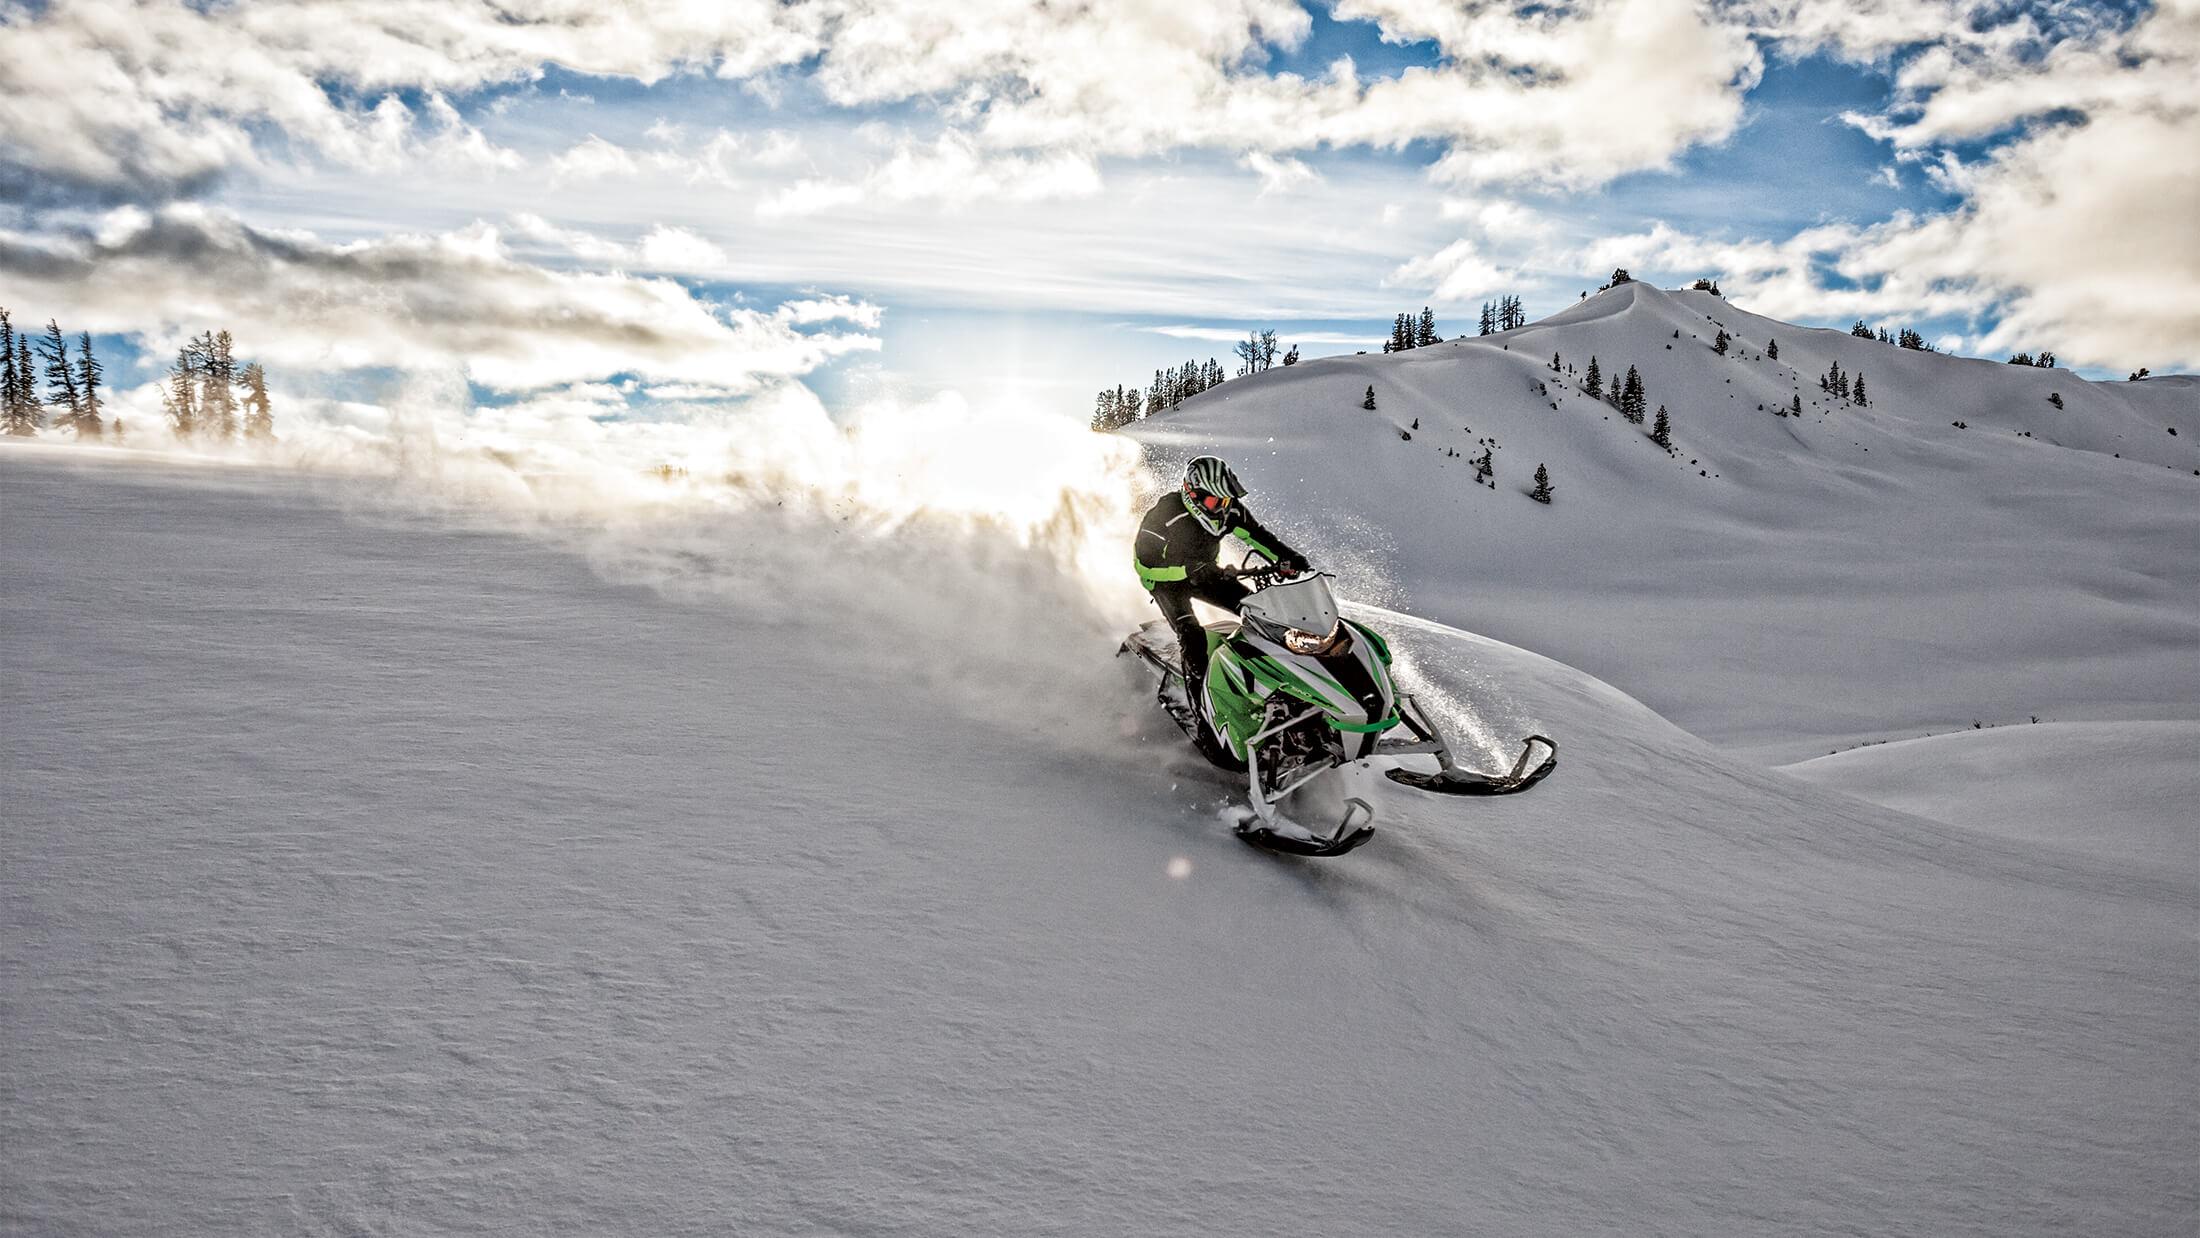 Сафари на снегоходах в горах